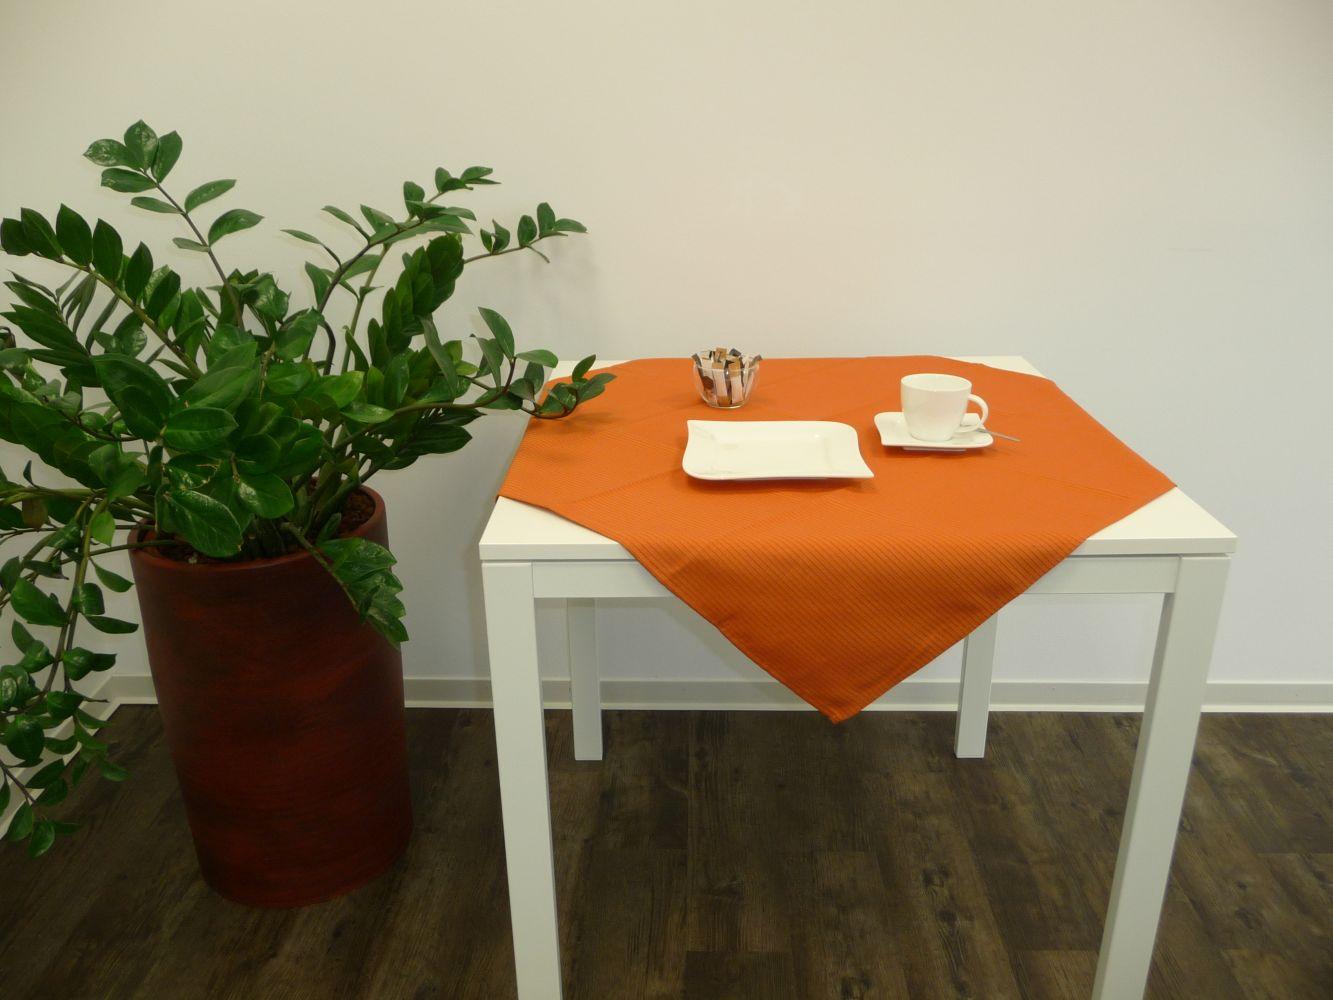 Levně Komashop Ubrus GABRIELA Farba: Oranžová,, Rozmer: 140 x 40 cm,